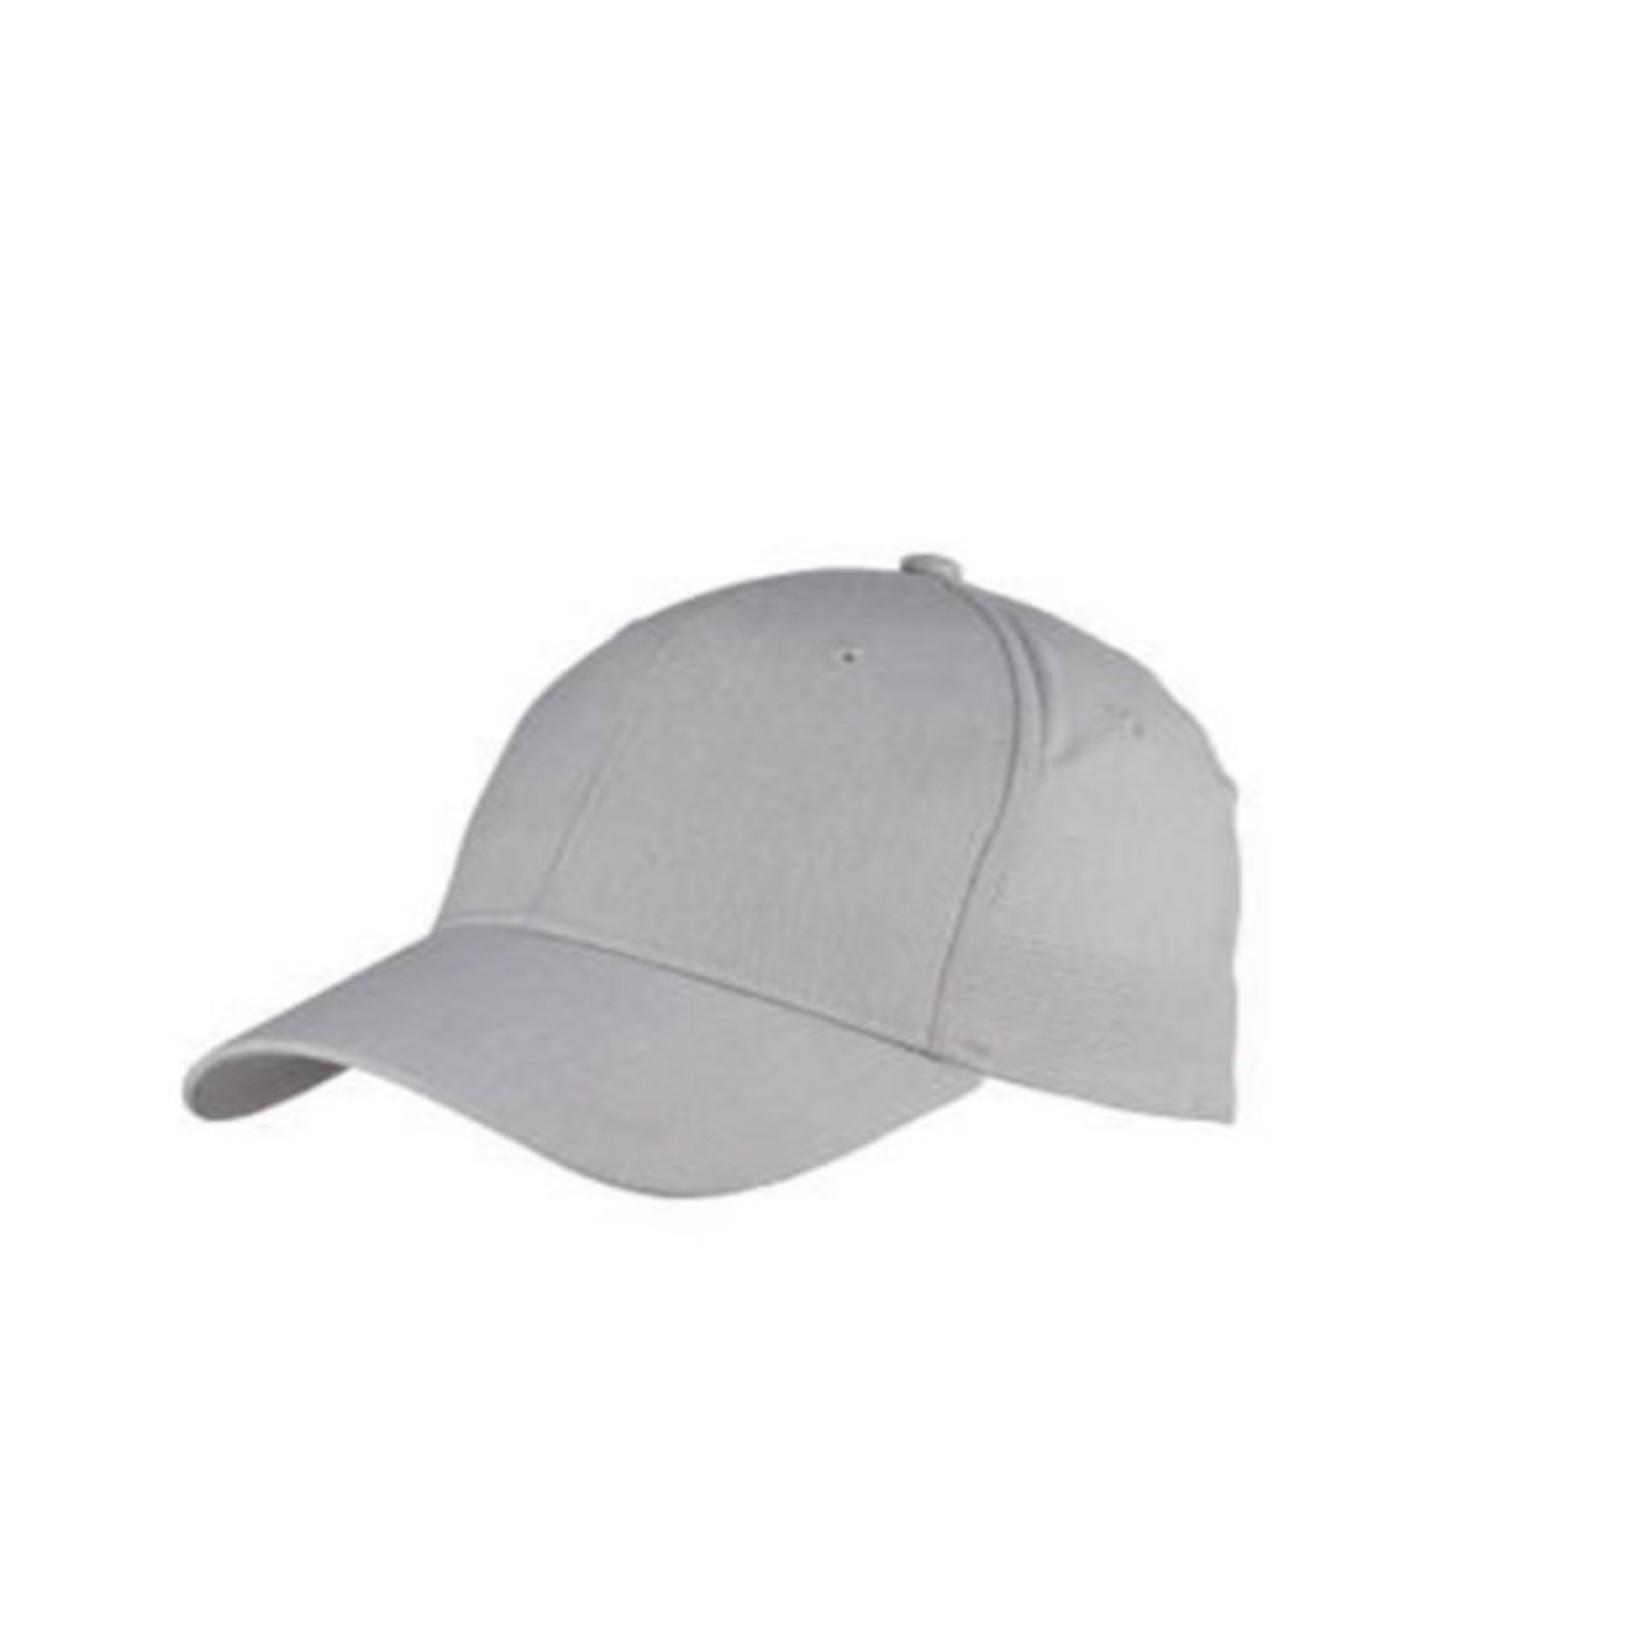 Kooringal Vive Sports Cap